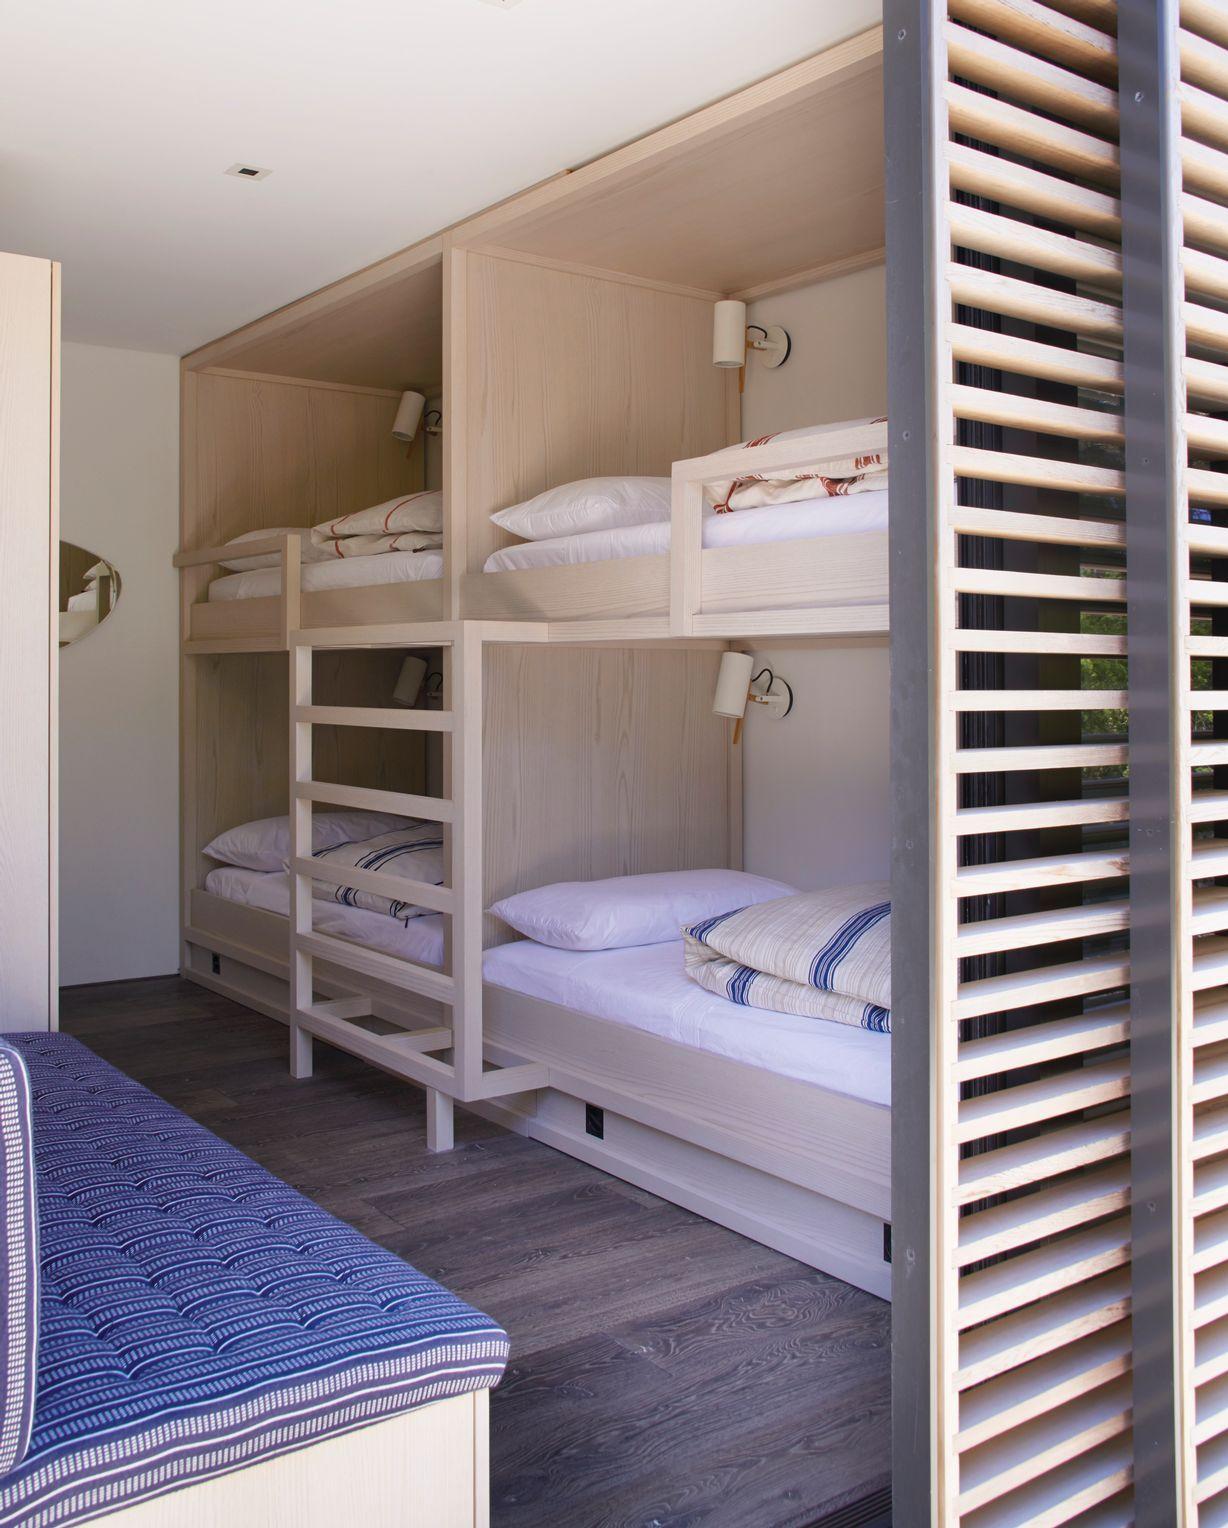 Loft bedroom privacy ideas  builtwithmammothsitesyabupushelbergcontentimg